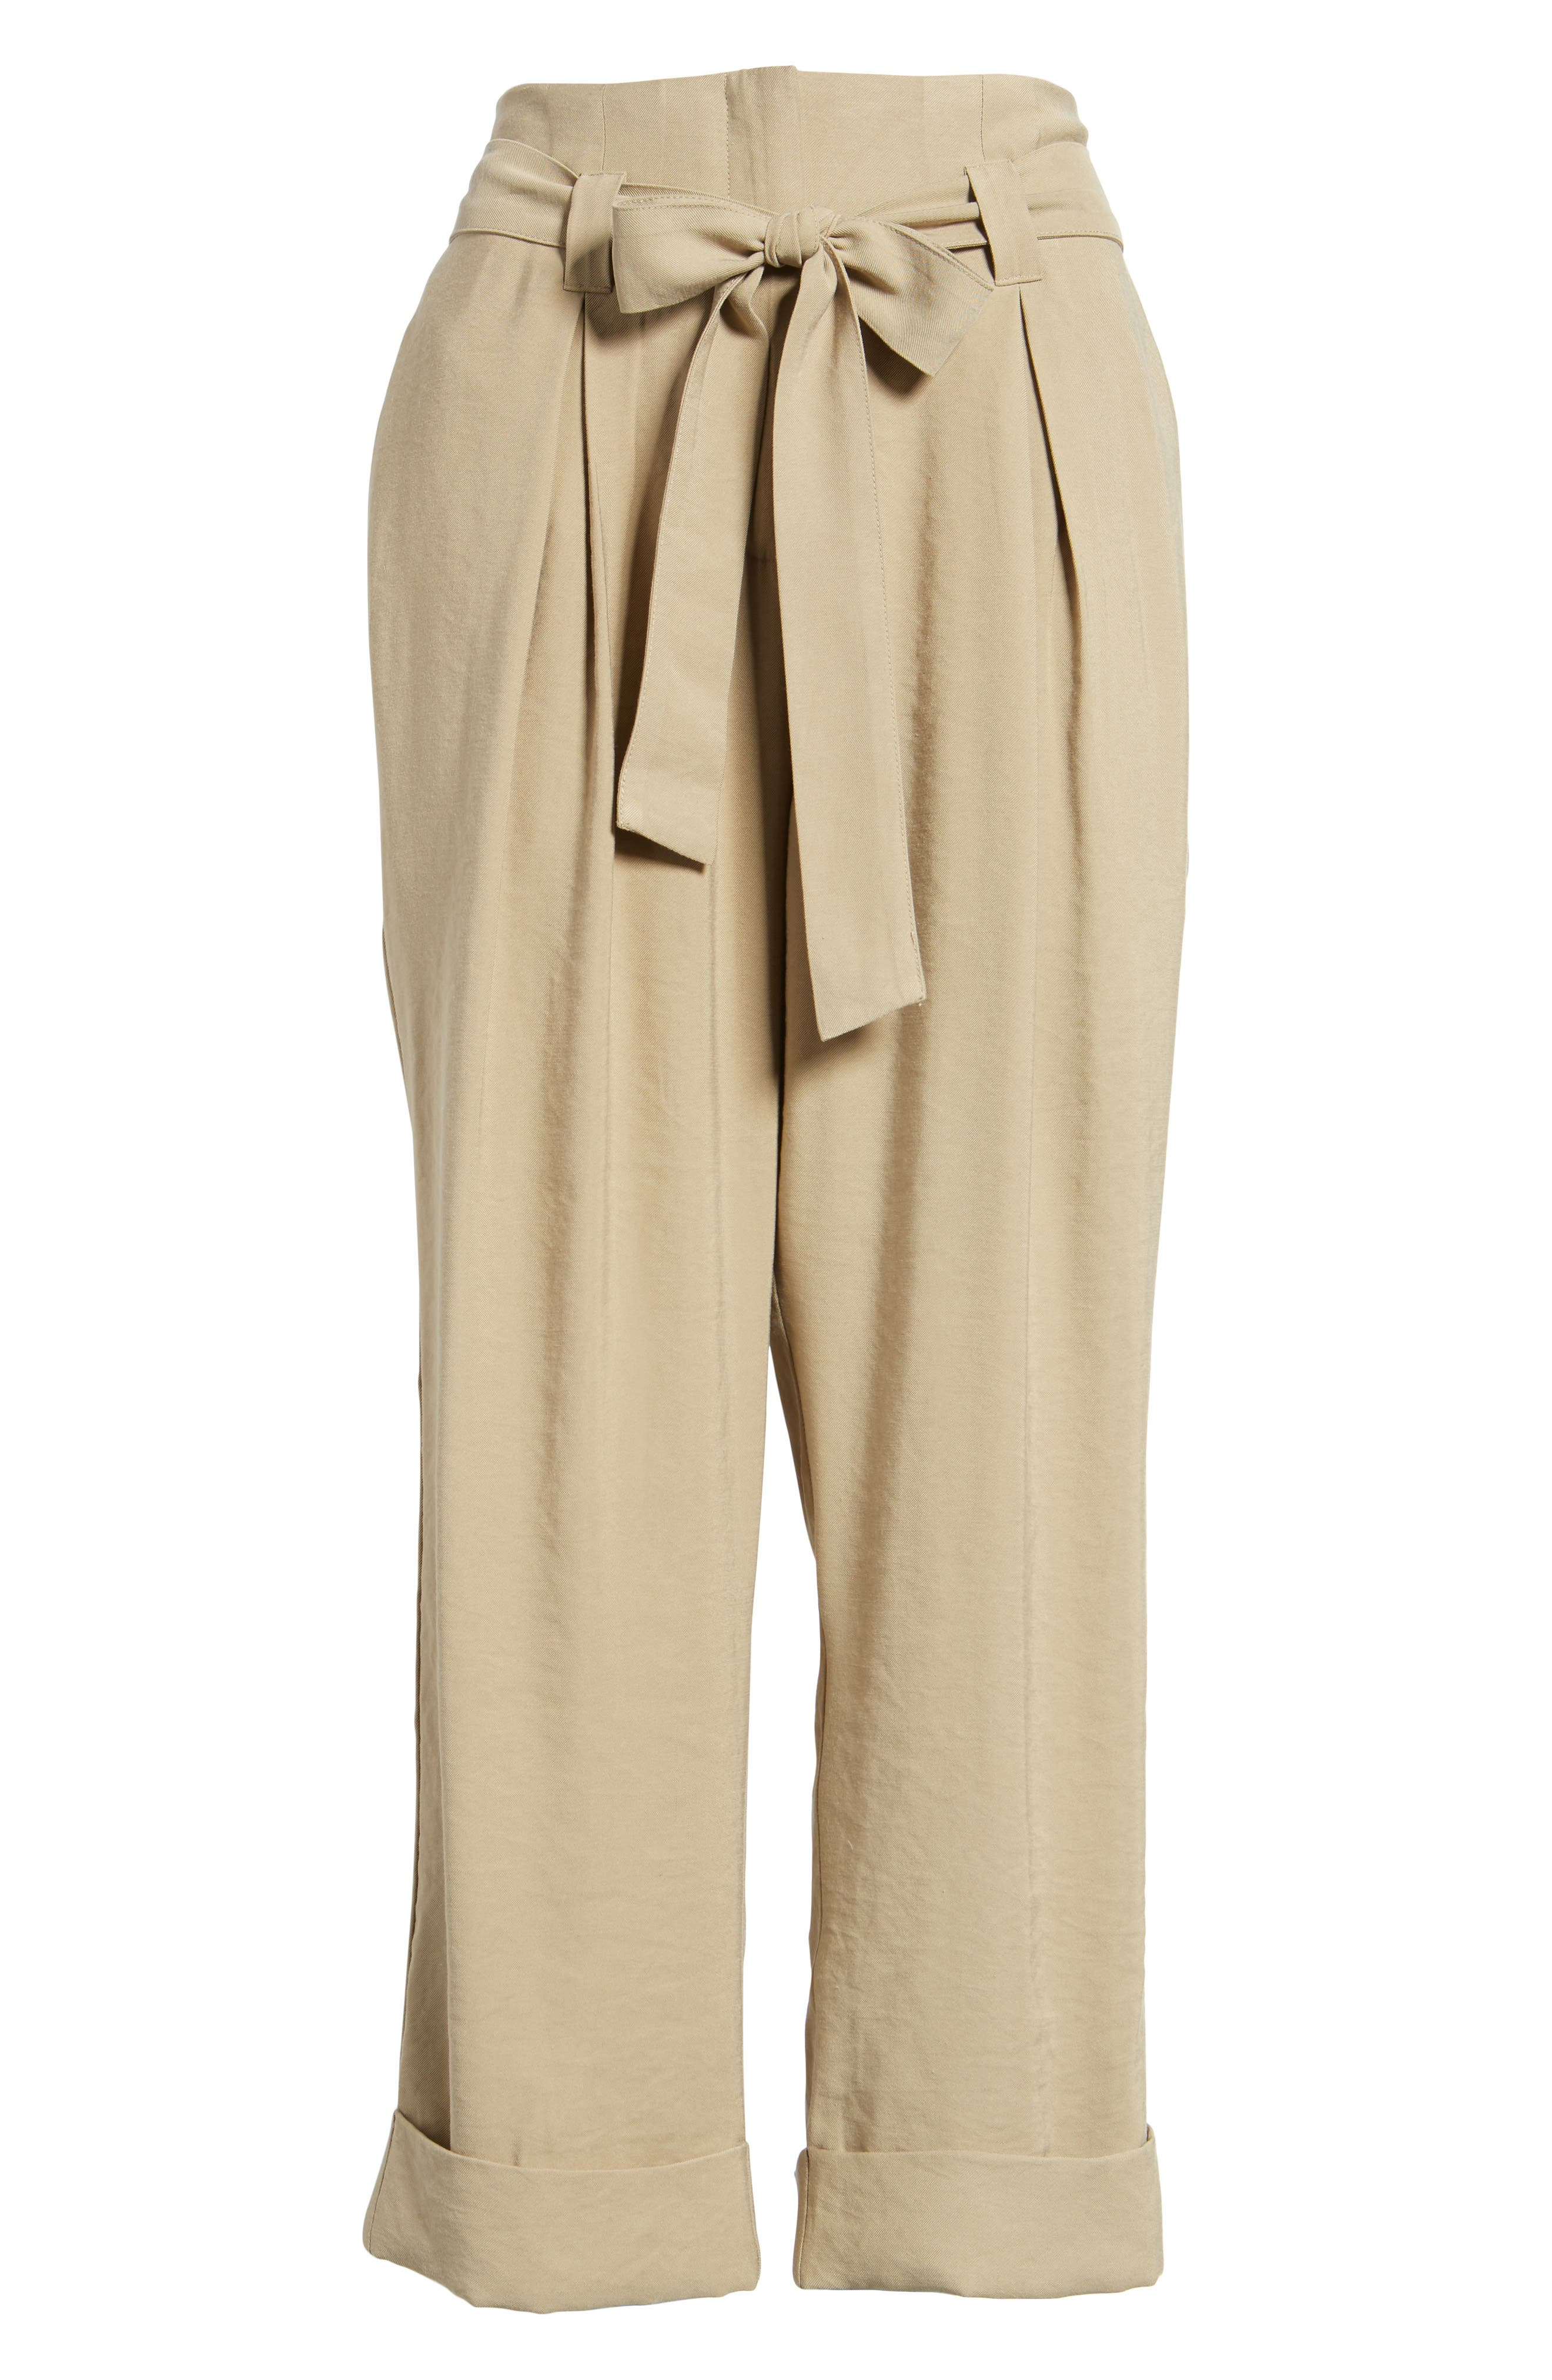 High Waist Tie Front Cropped Pants,                             Alternate thumbnail 6, color,                             Latte